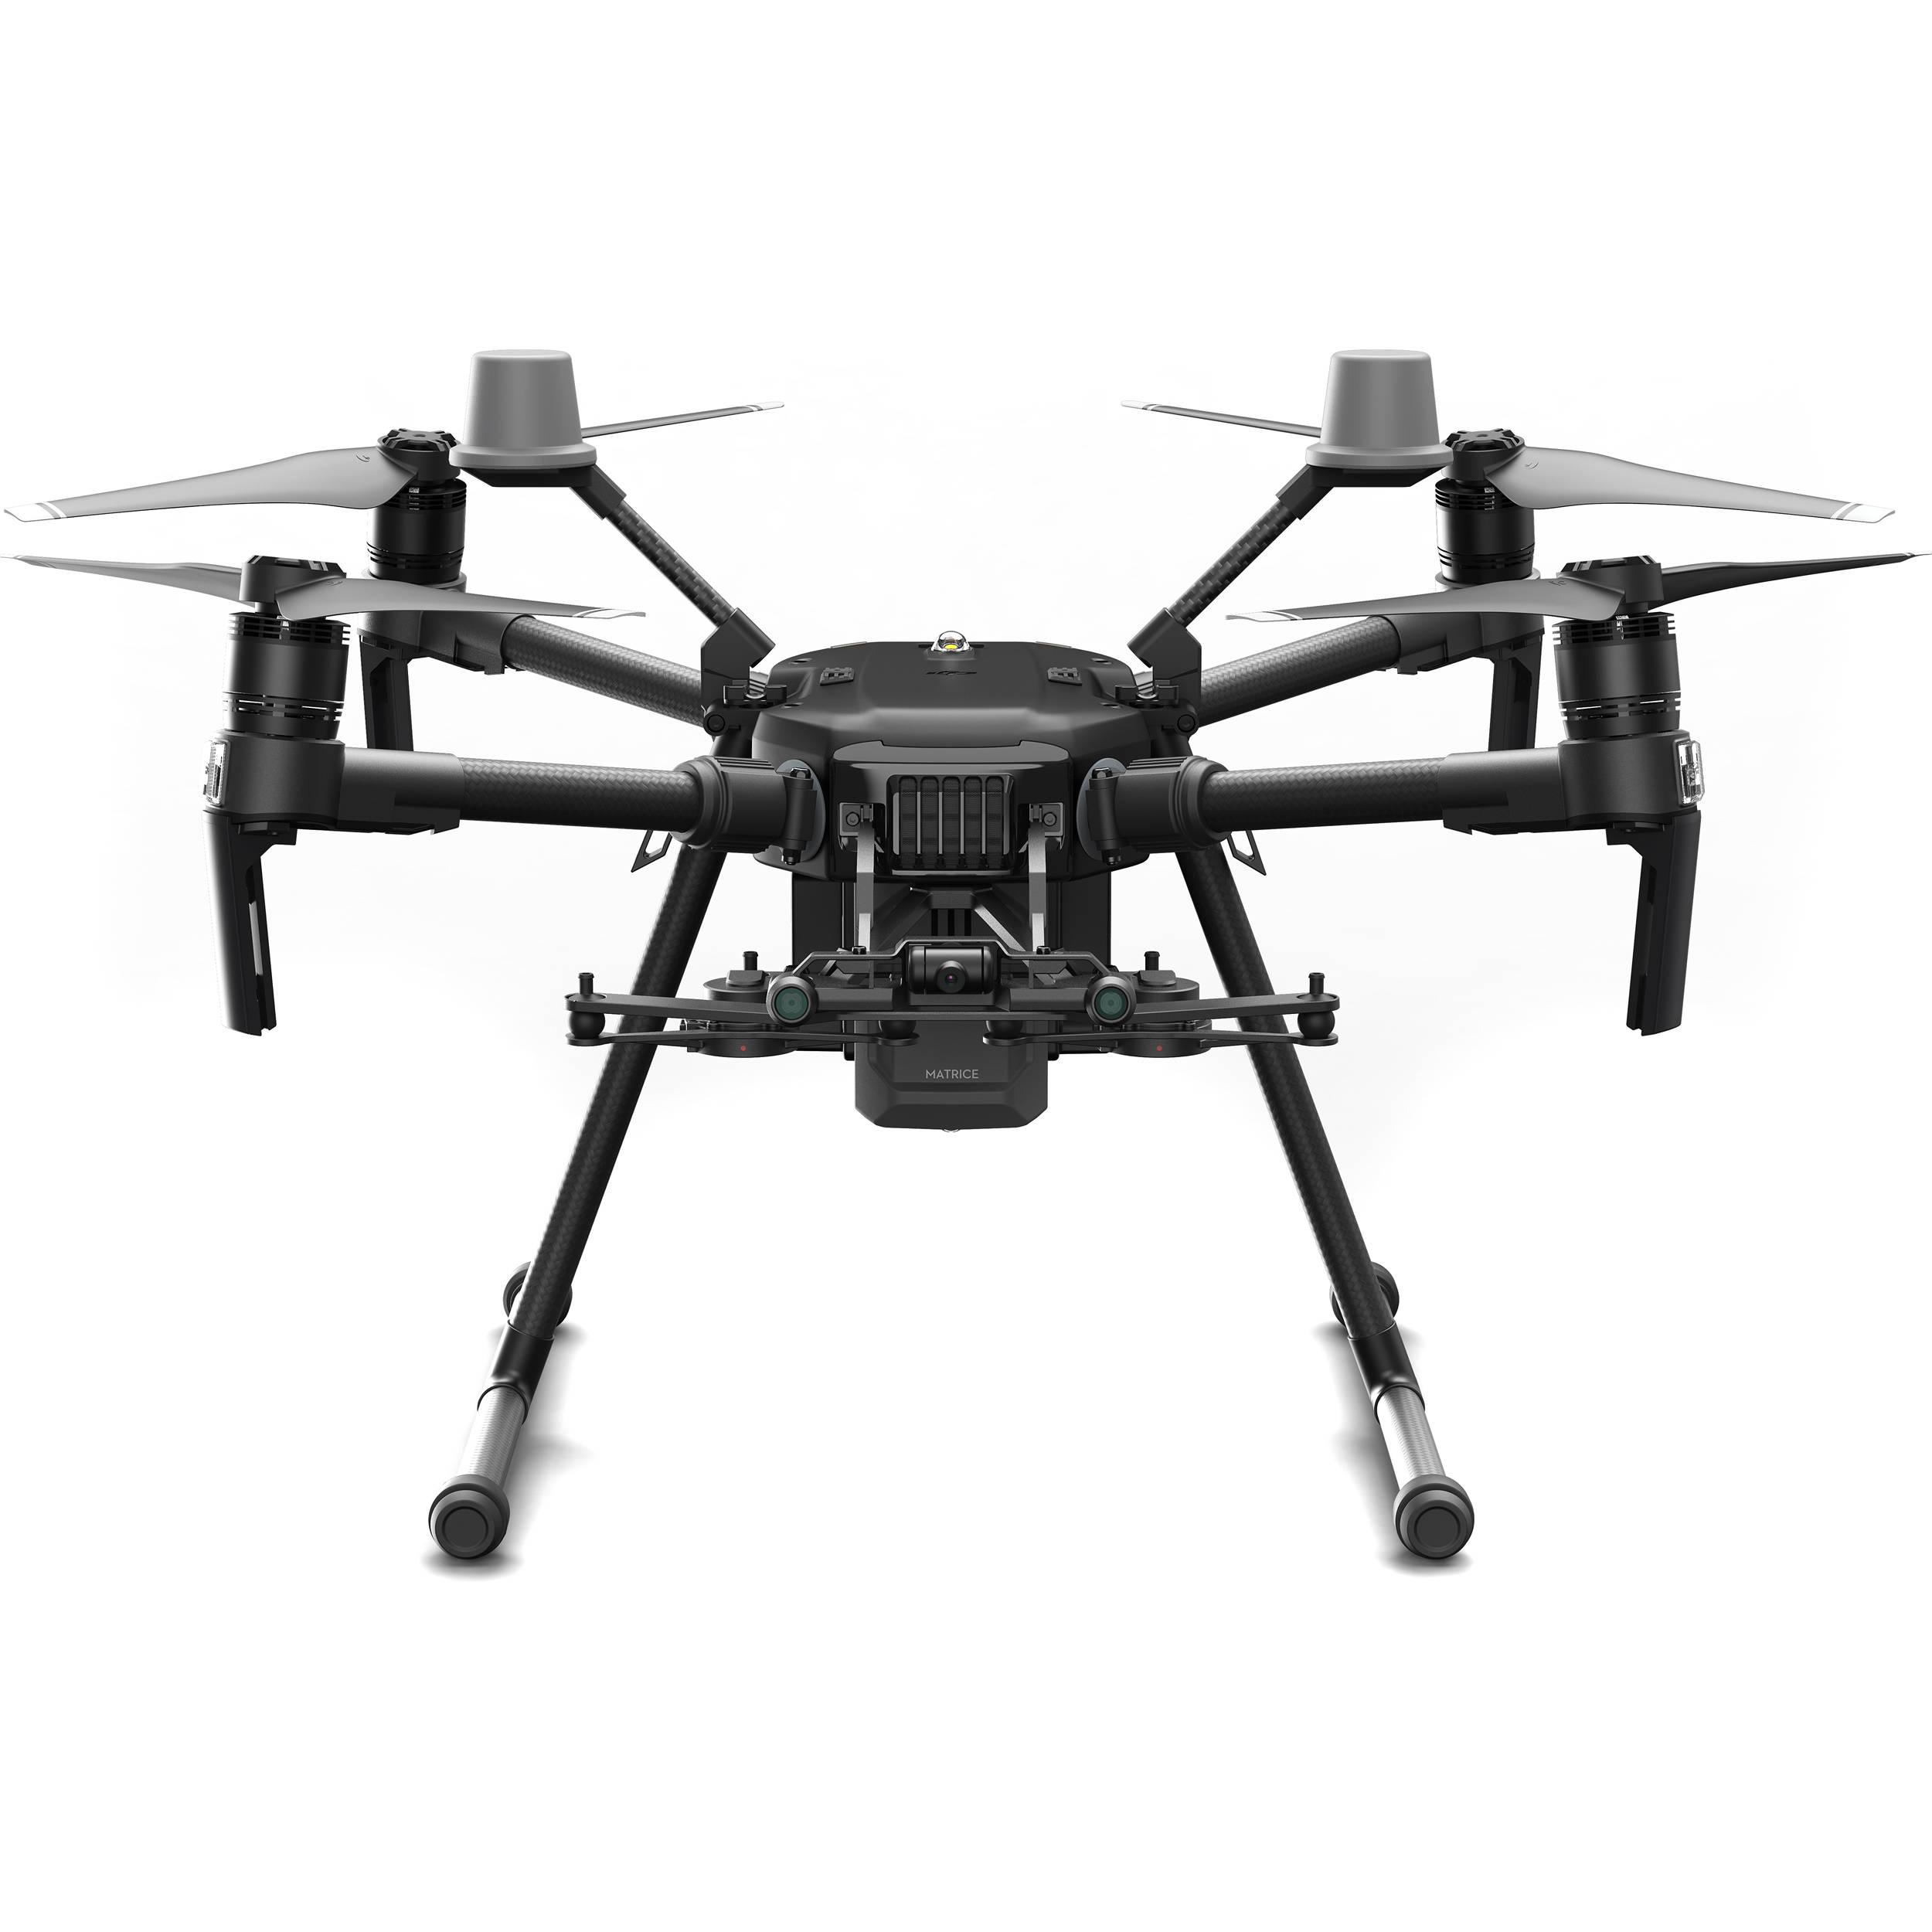 DJI Matrice 210 RTK V2 Professional Quadcopter CP EN 00000063 01